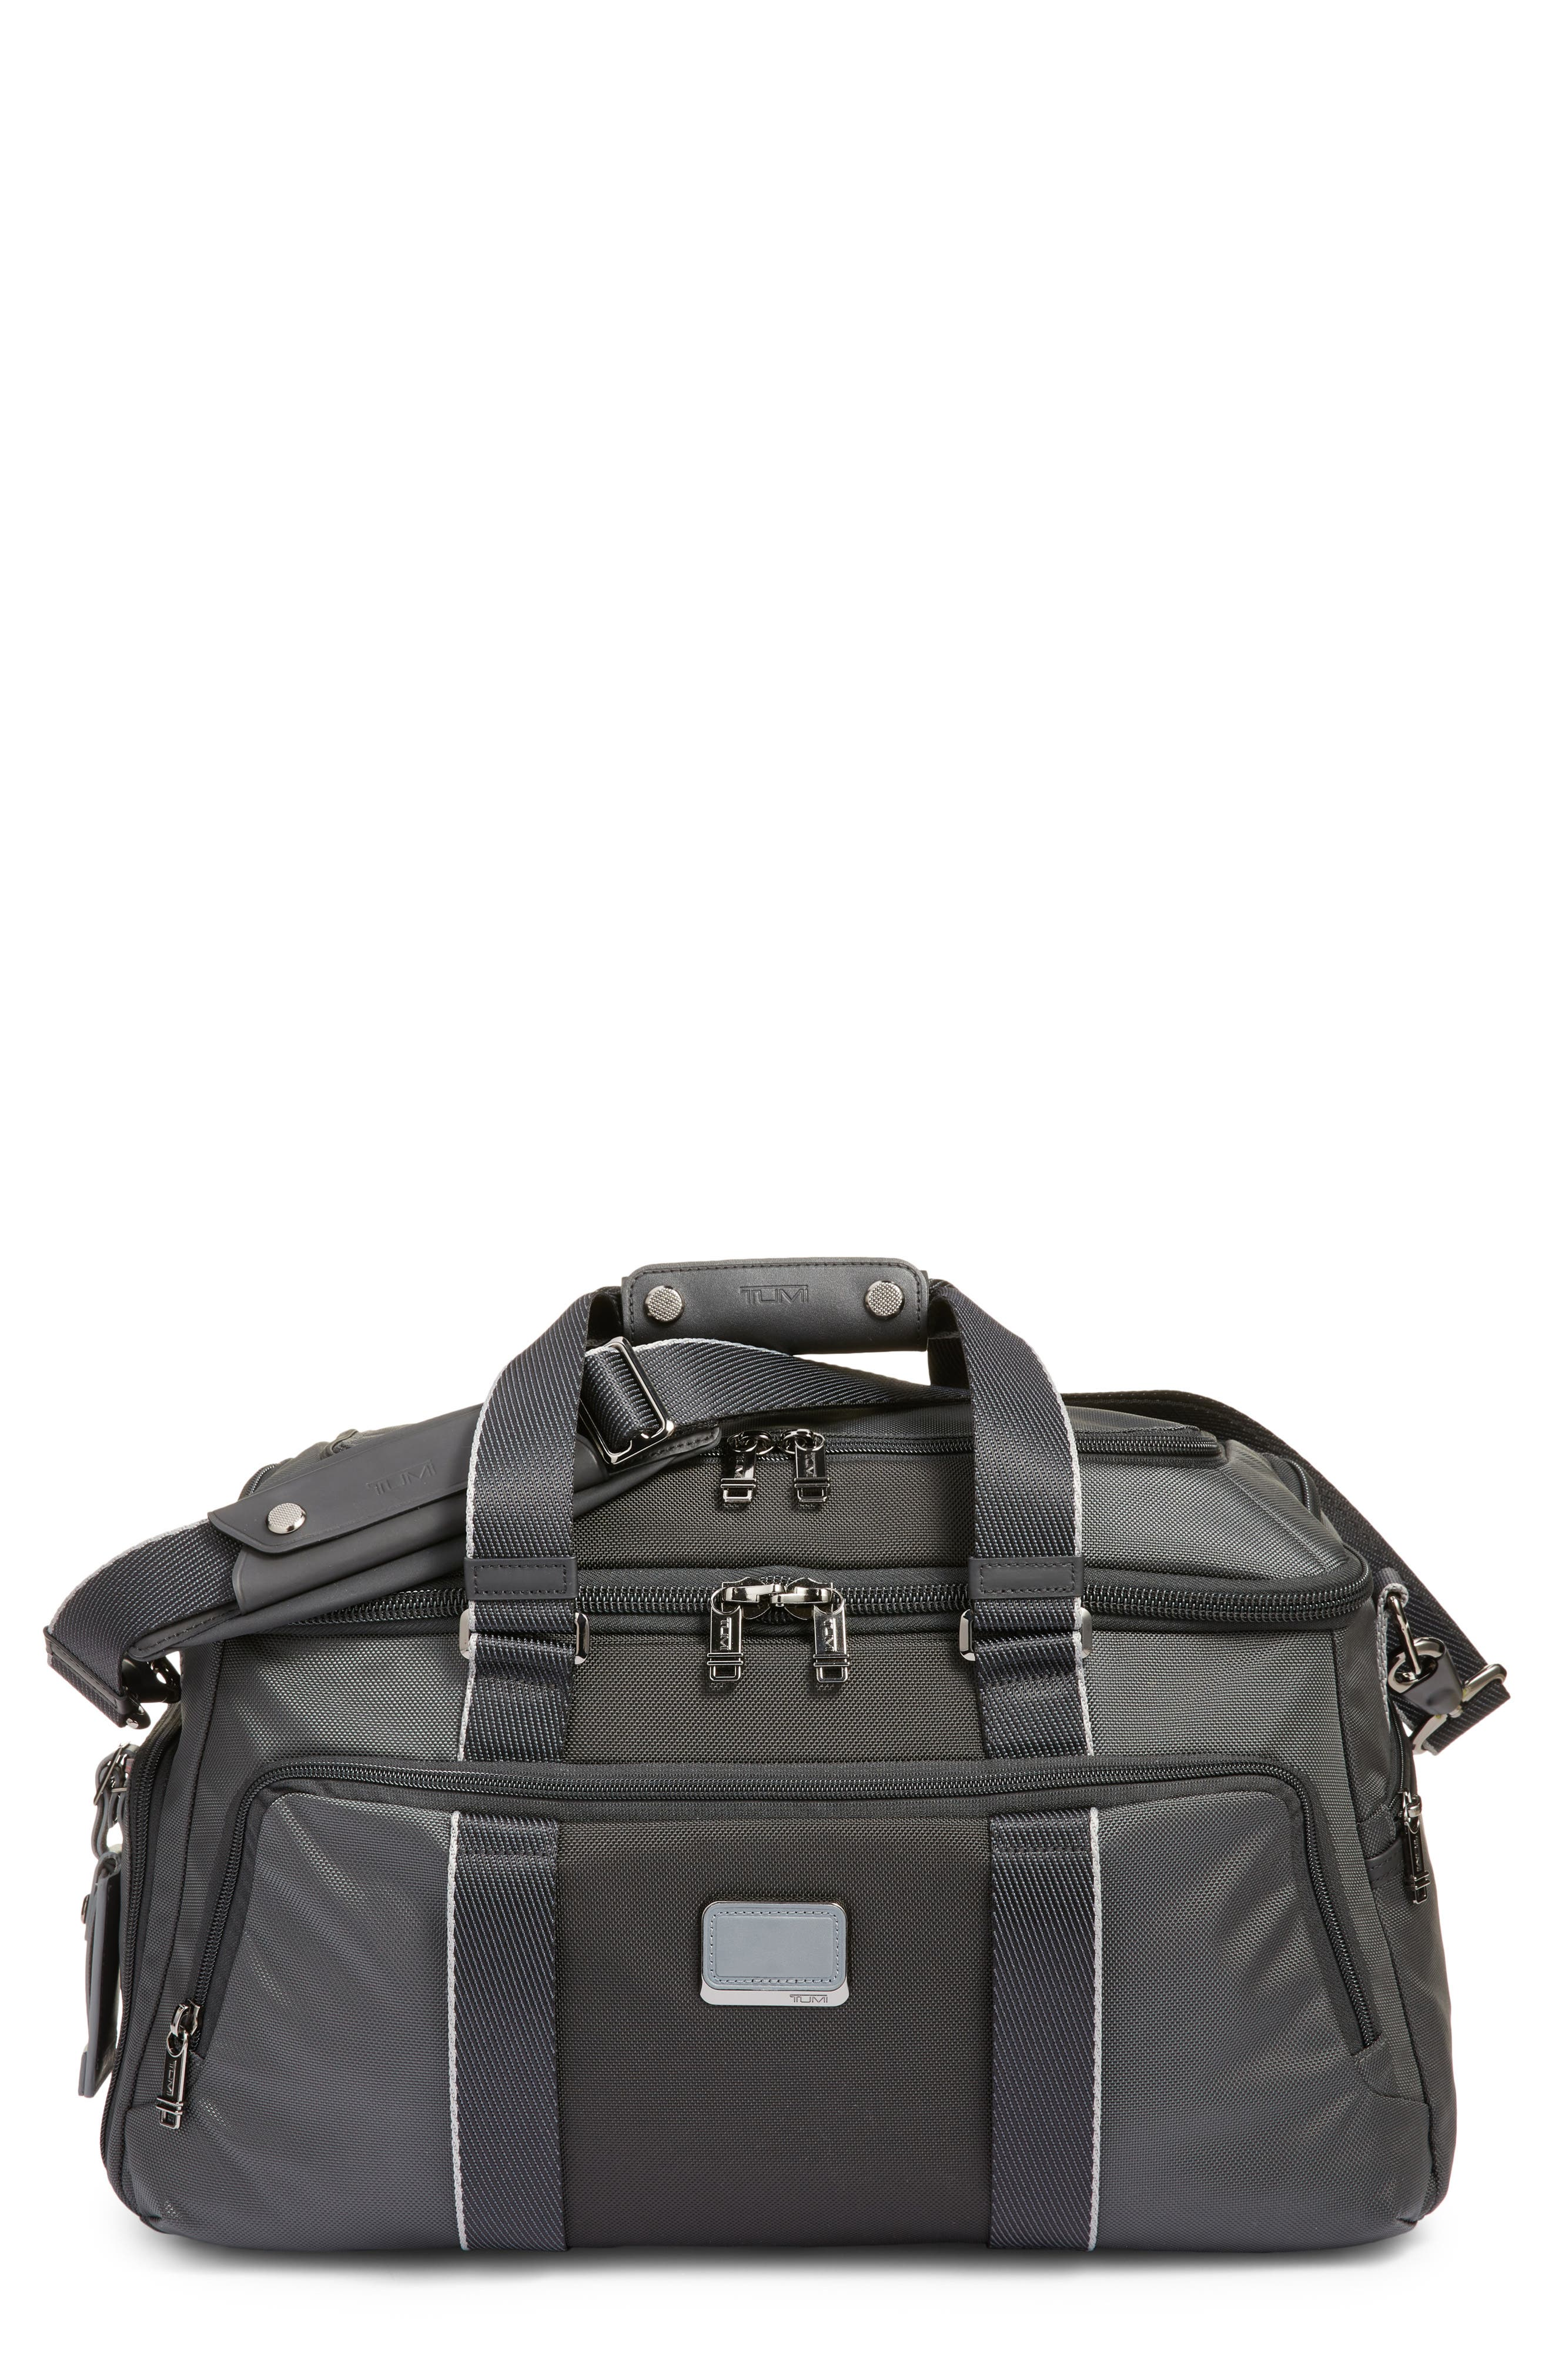 Alpha Bravo Mccoy Duffle Bag